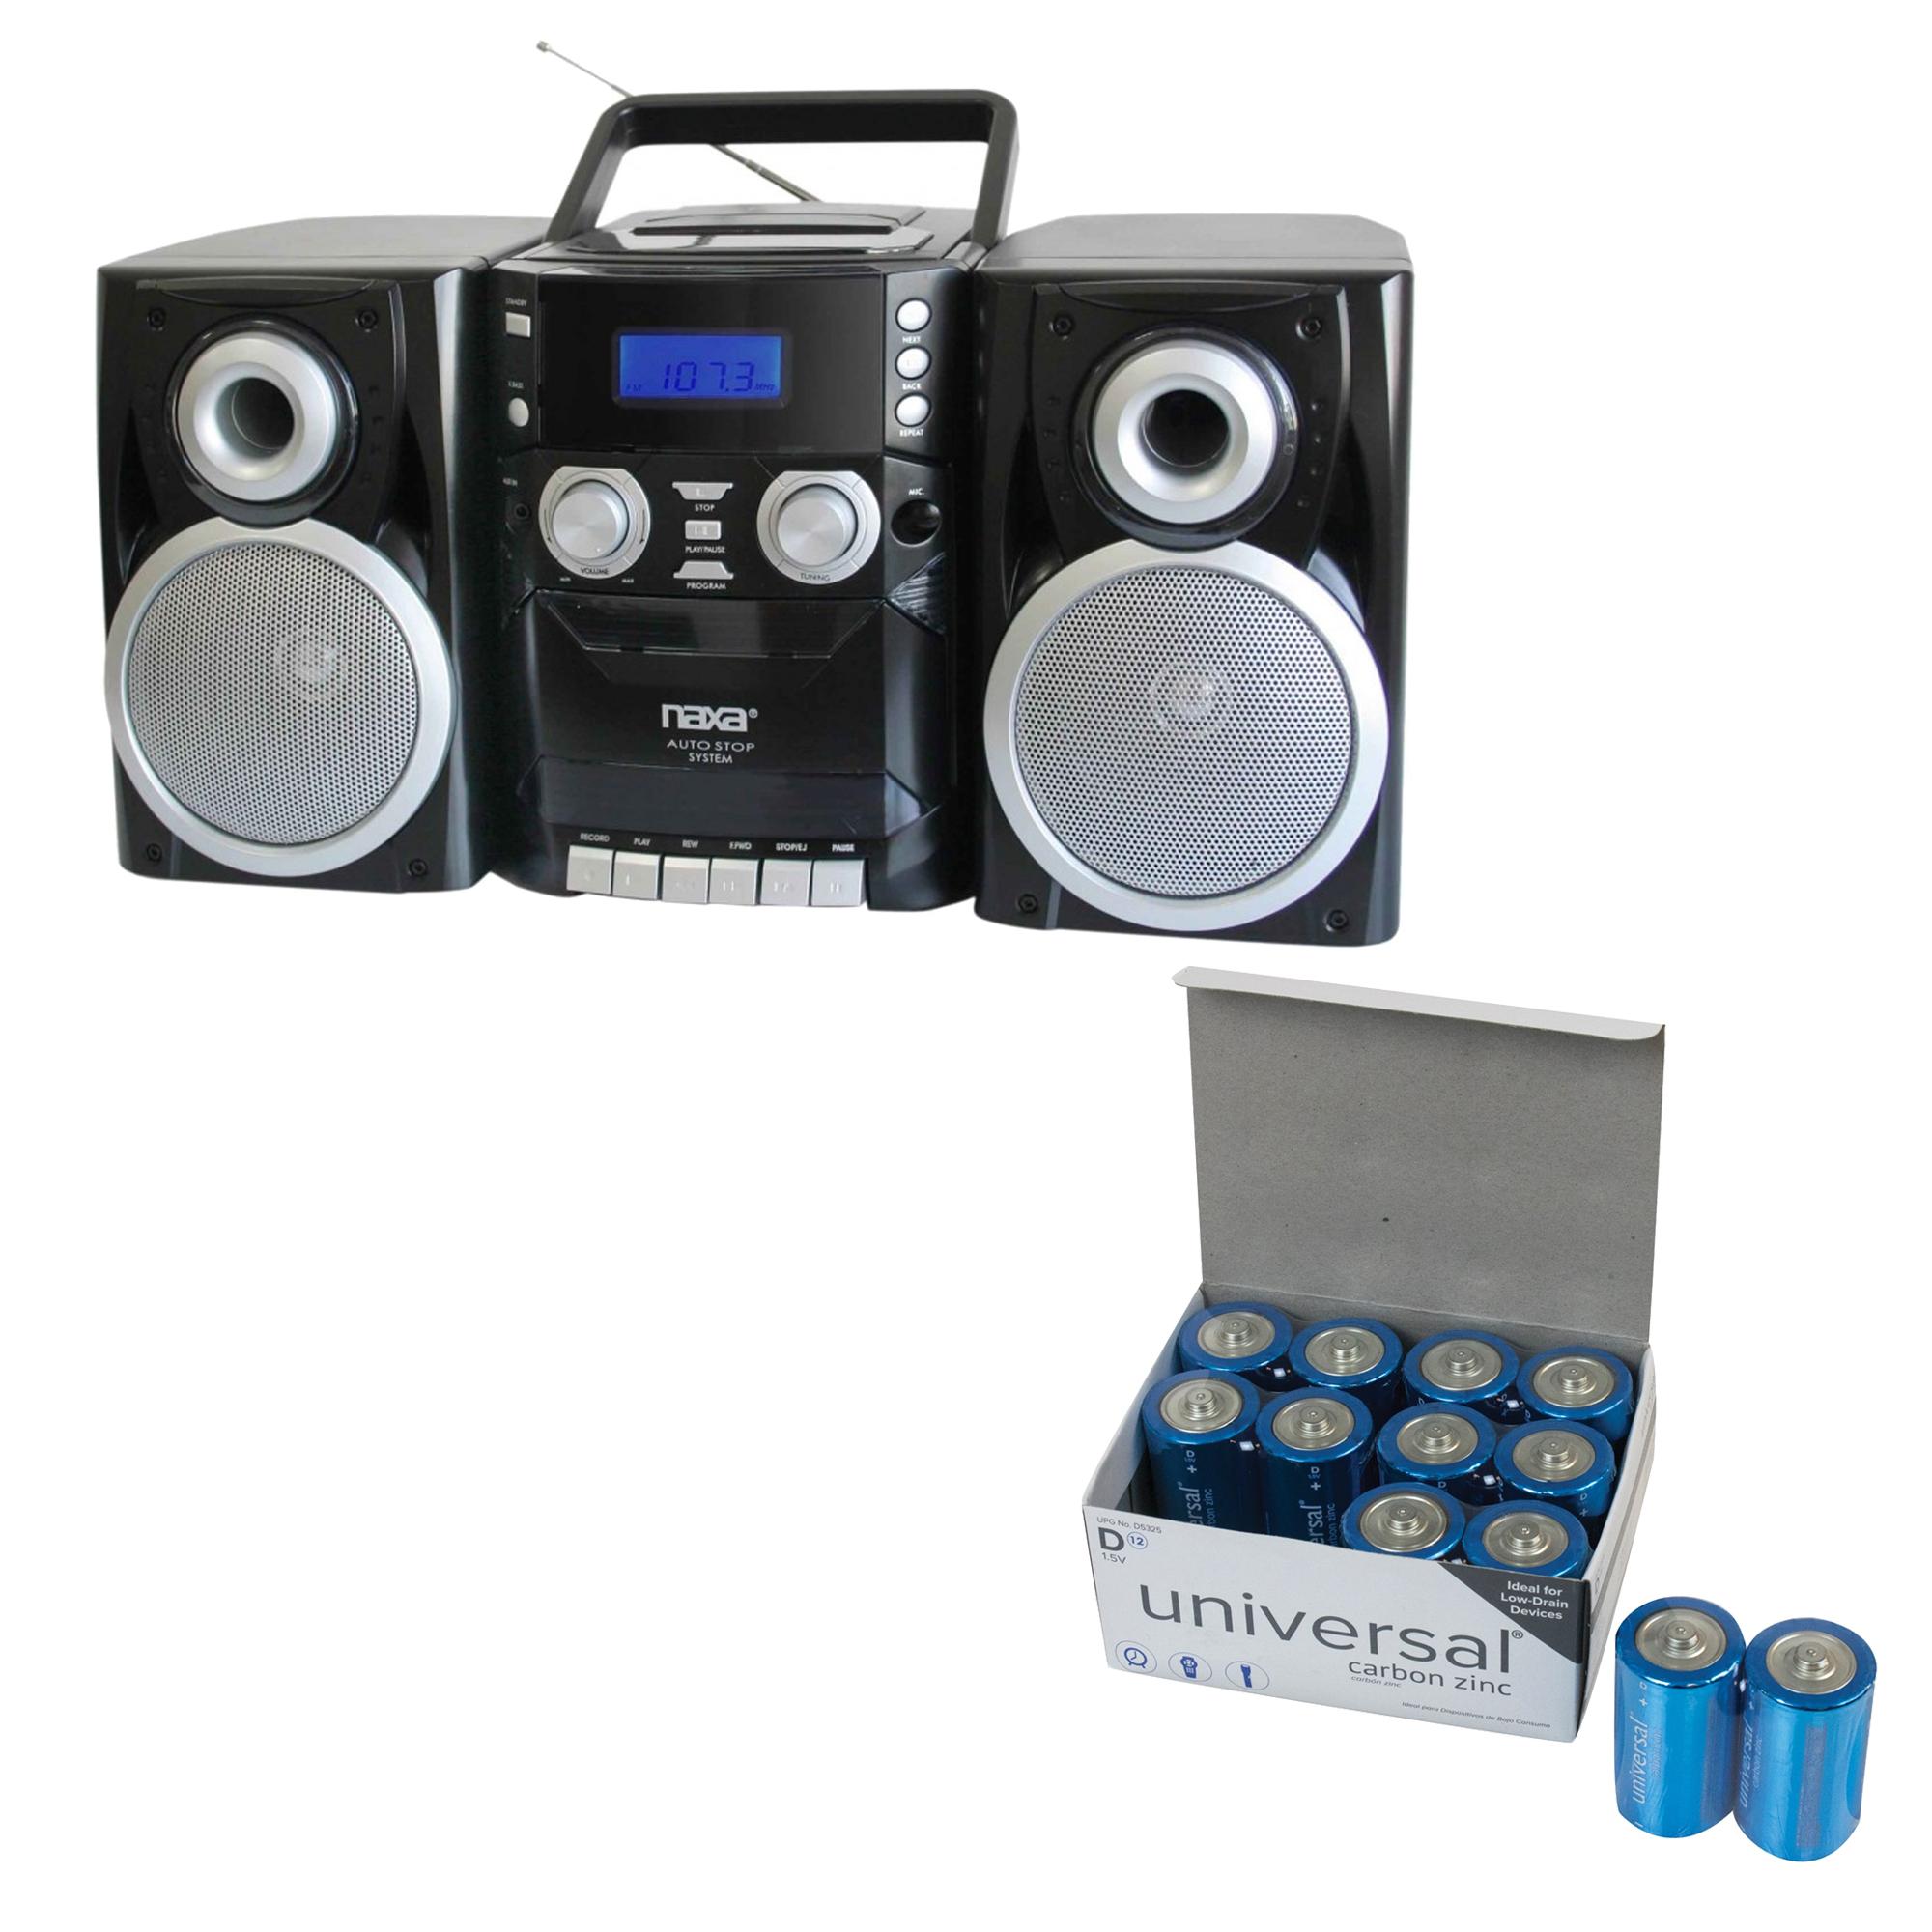 Naxa NPB426 Portable CD Player With AM/FM Radio, Cassette & Detachable Speakers & UPG D 12 PACK